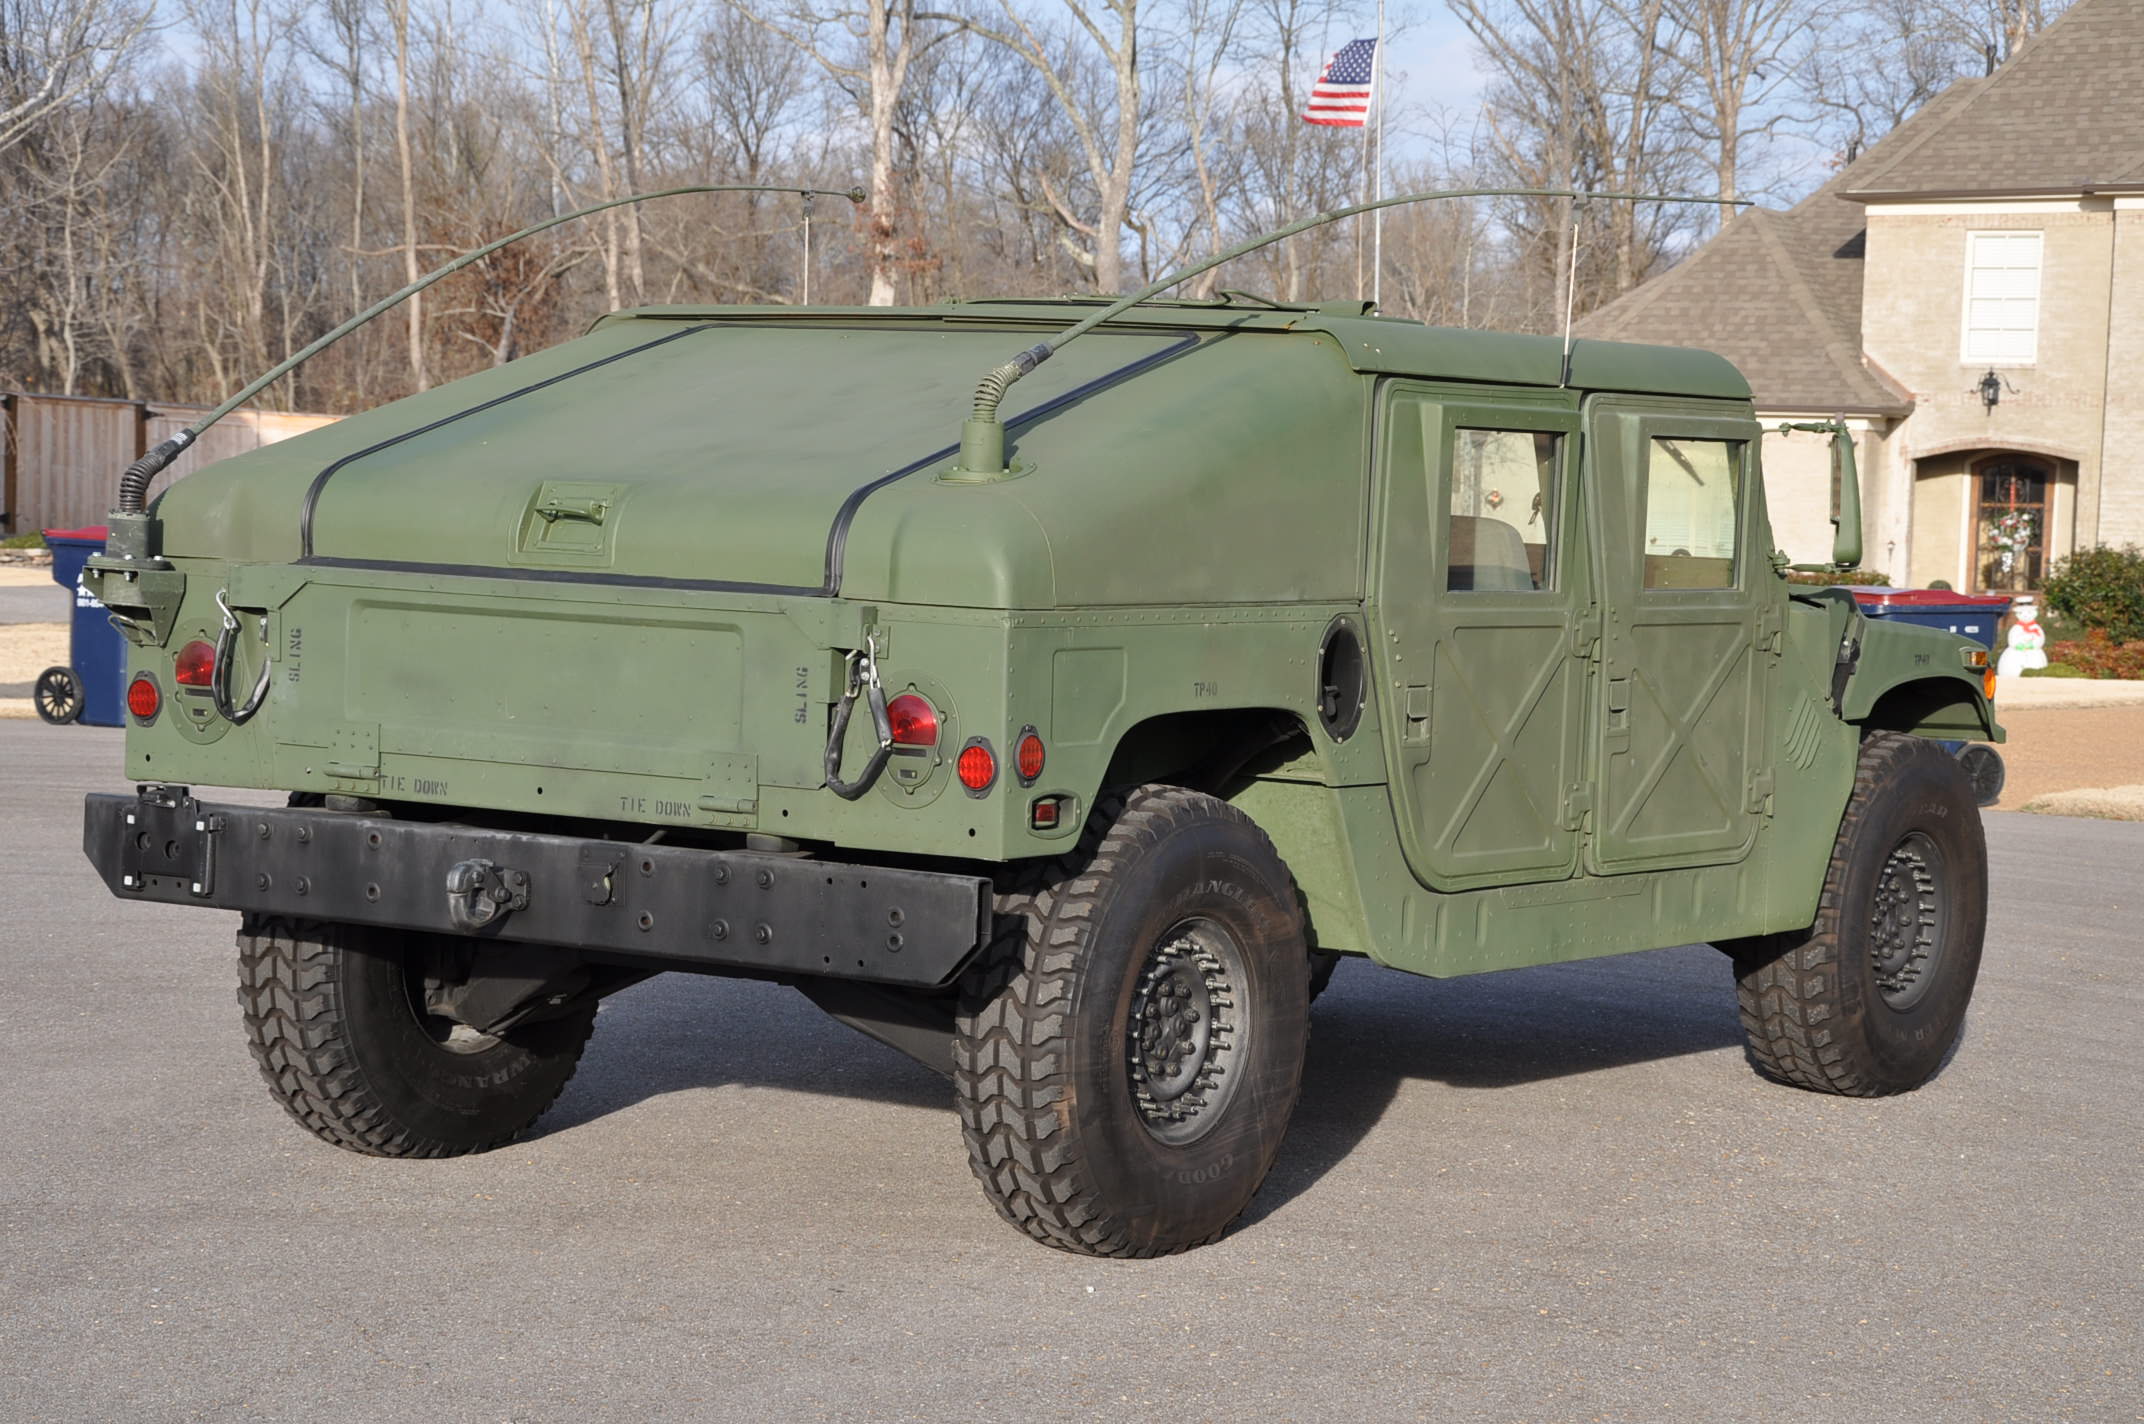 M1009 Fuse Box Manual E Books Cucv Wiring Diagram Librarymilitary Humvee 24 Images